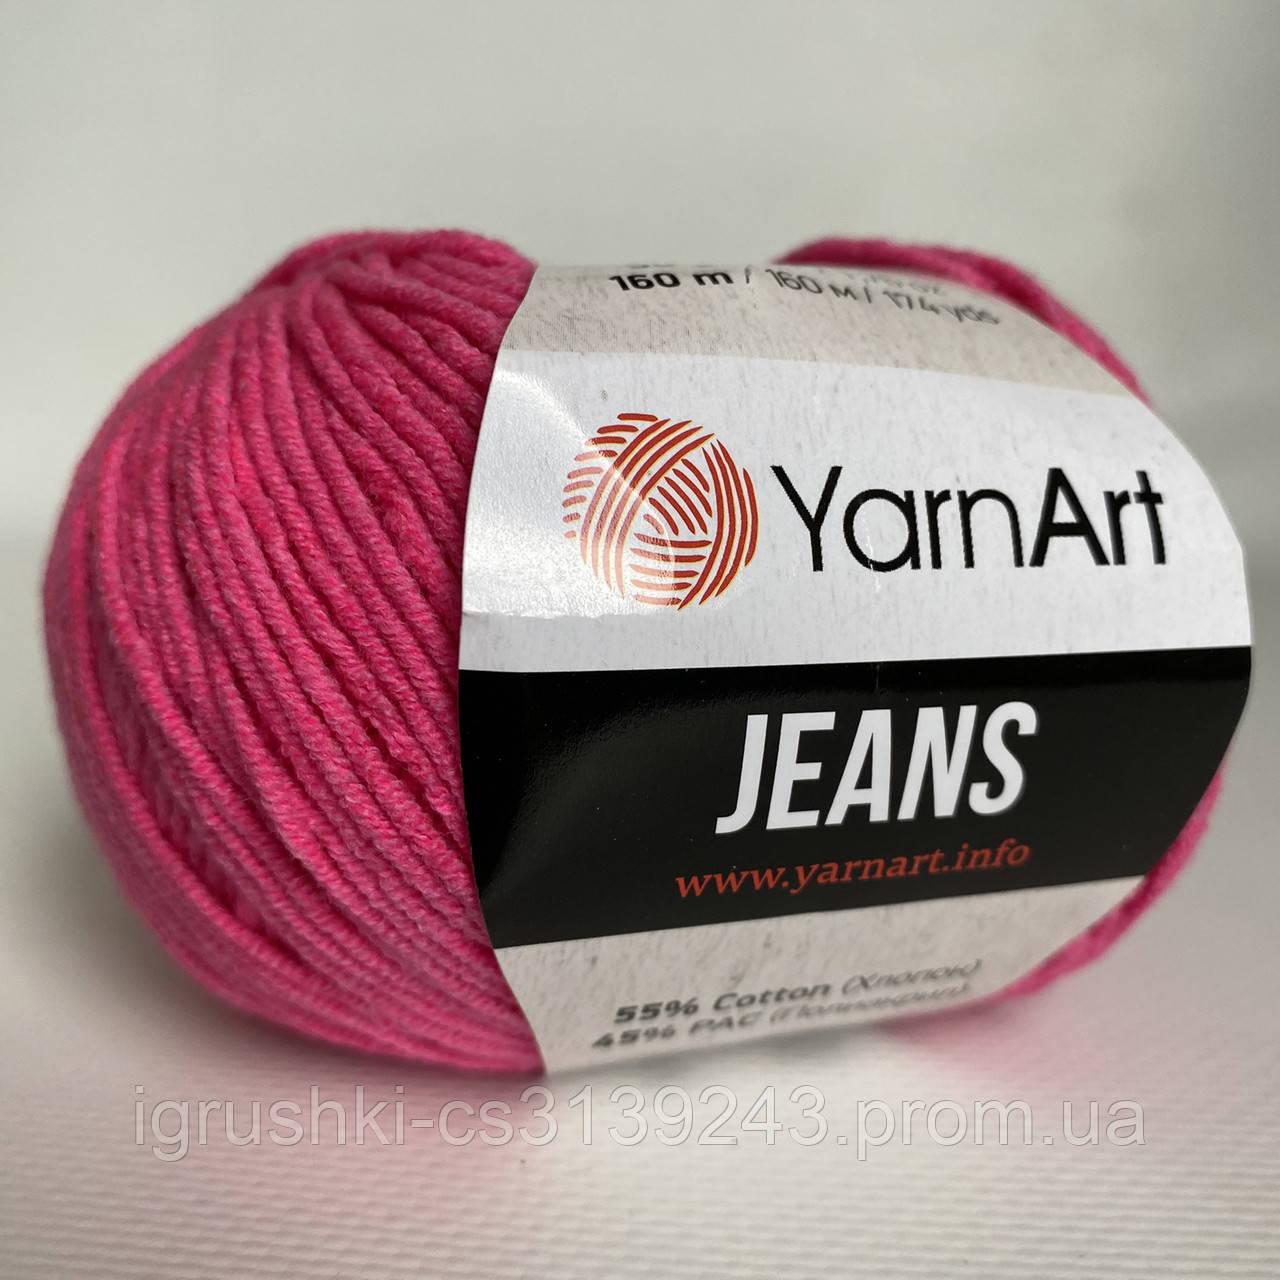 YarnArt Jeans (ярнарт джинс) 59 Малина